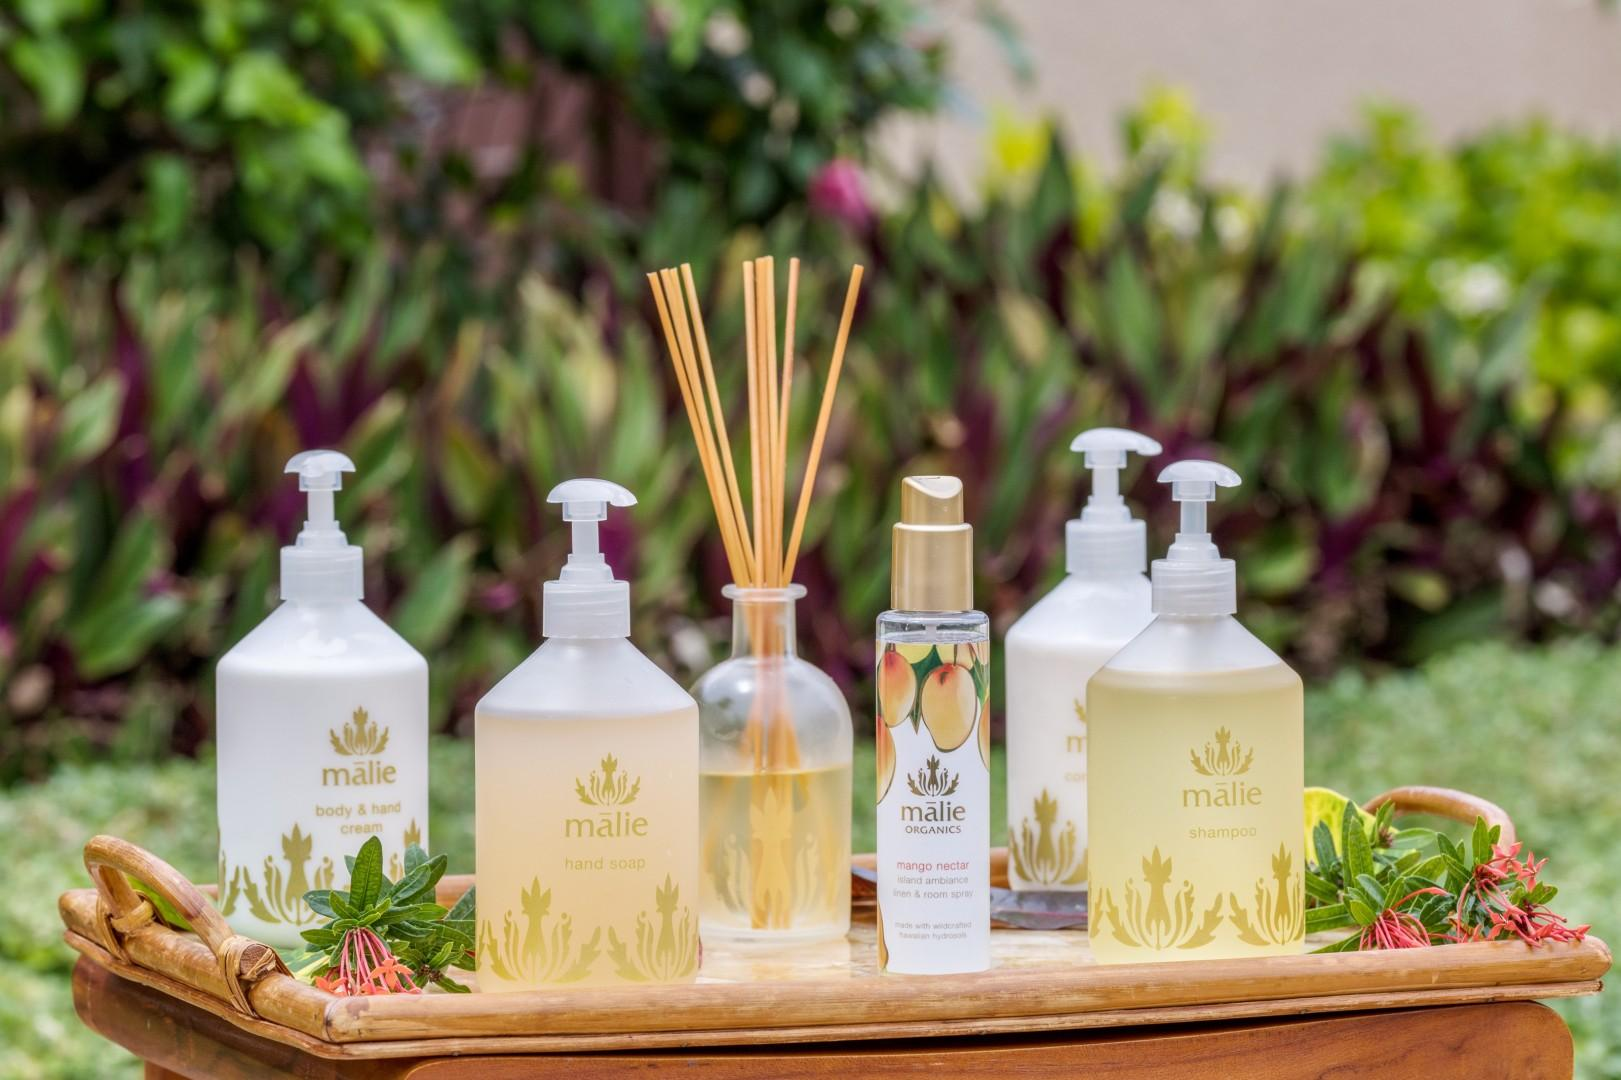 Organic Hawaii-Made Malie Amenities Delight the Senses in Every Bathroom